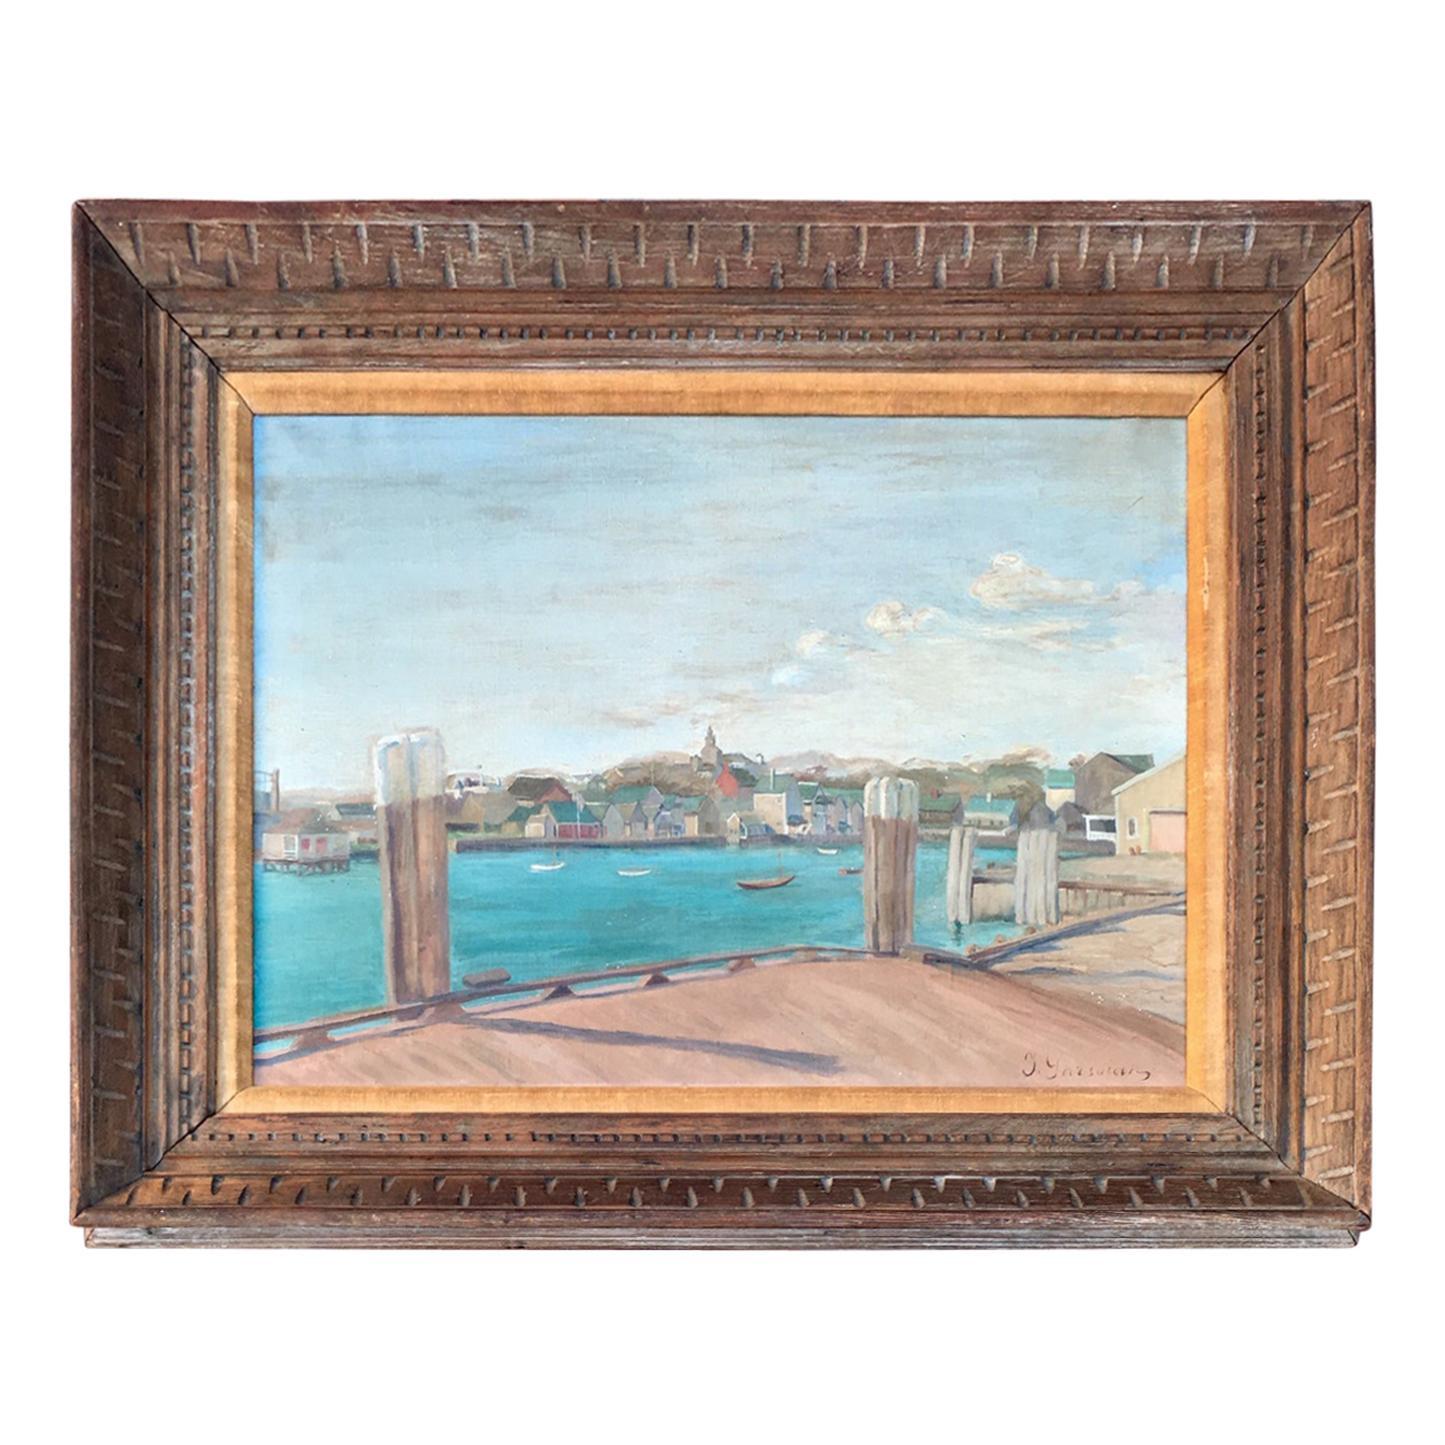 Nantucket Harbor Scene, by Inna Garsoian